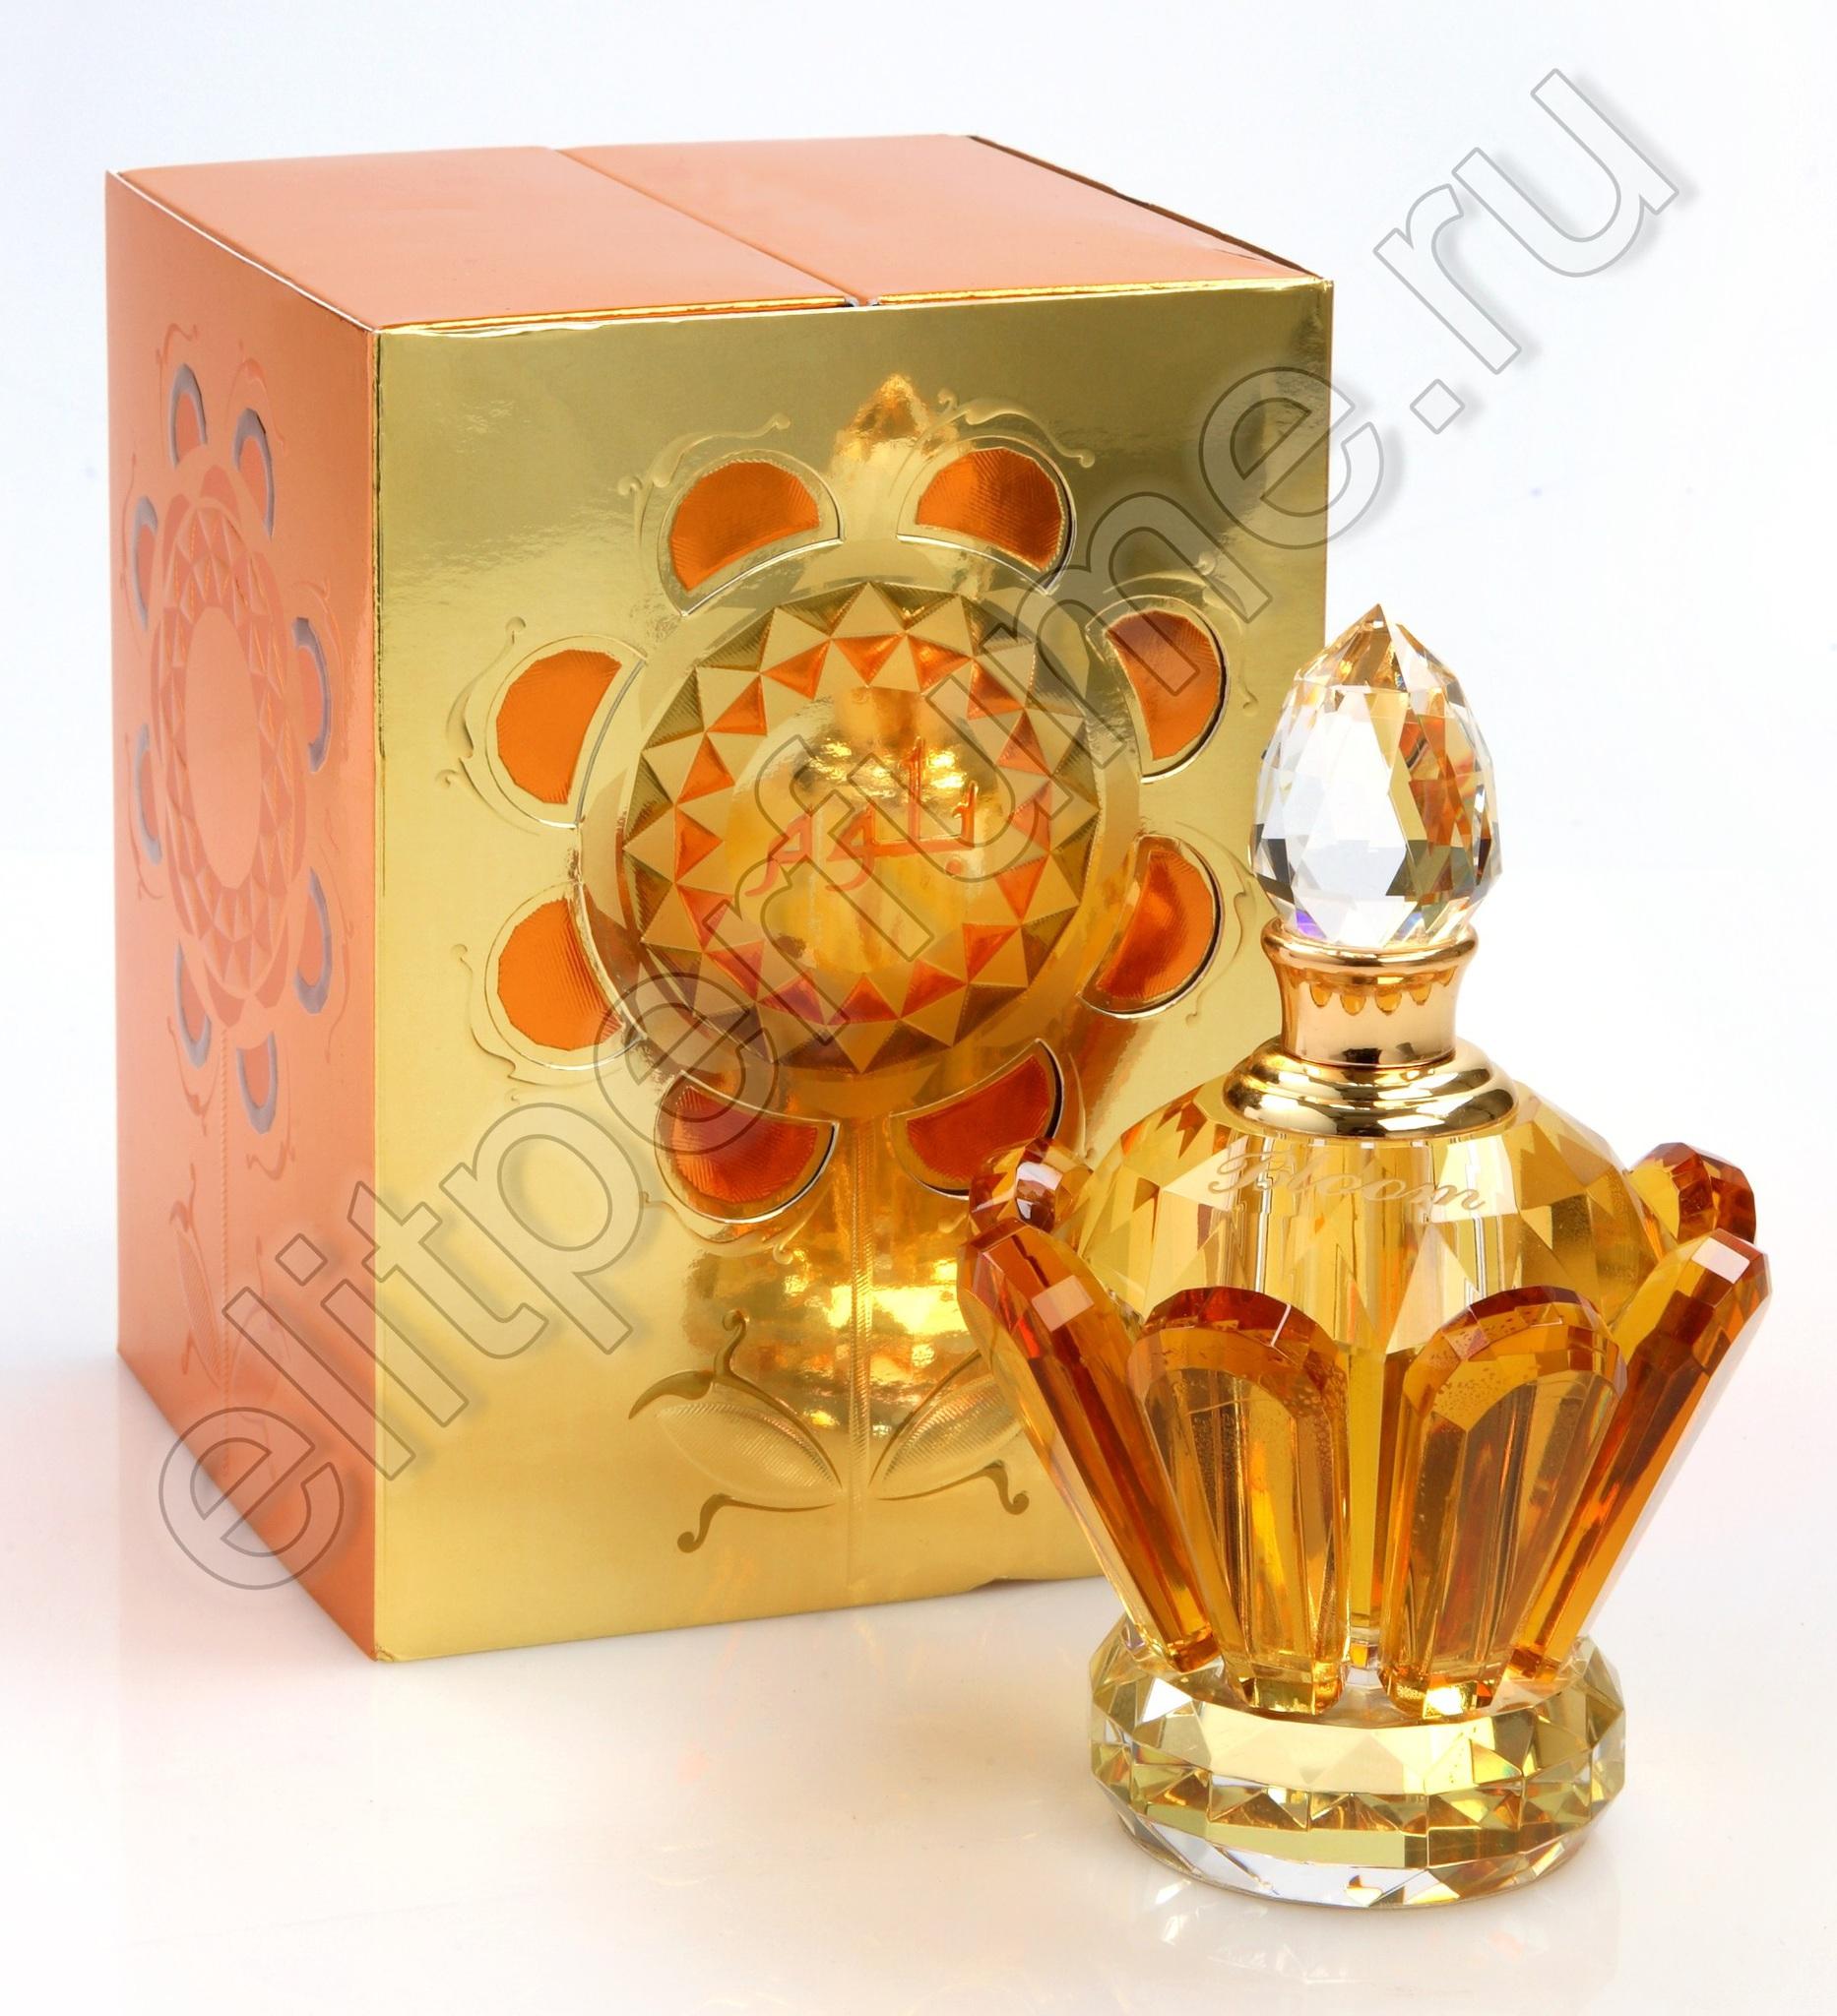 Бутон / Bloom 12 мл арабские масляные духи от Аль Харамайн Al Haramain Perfumes